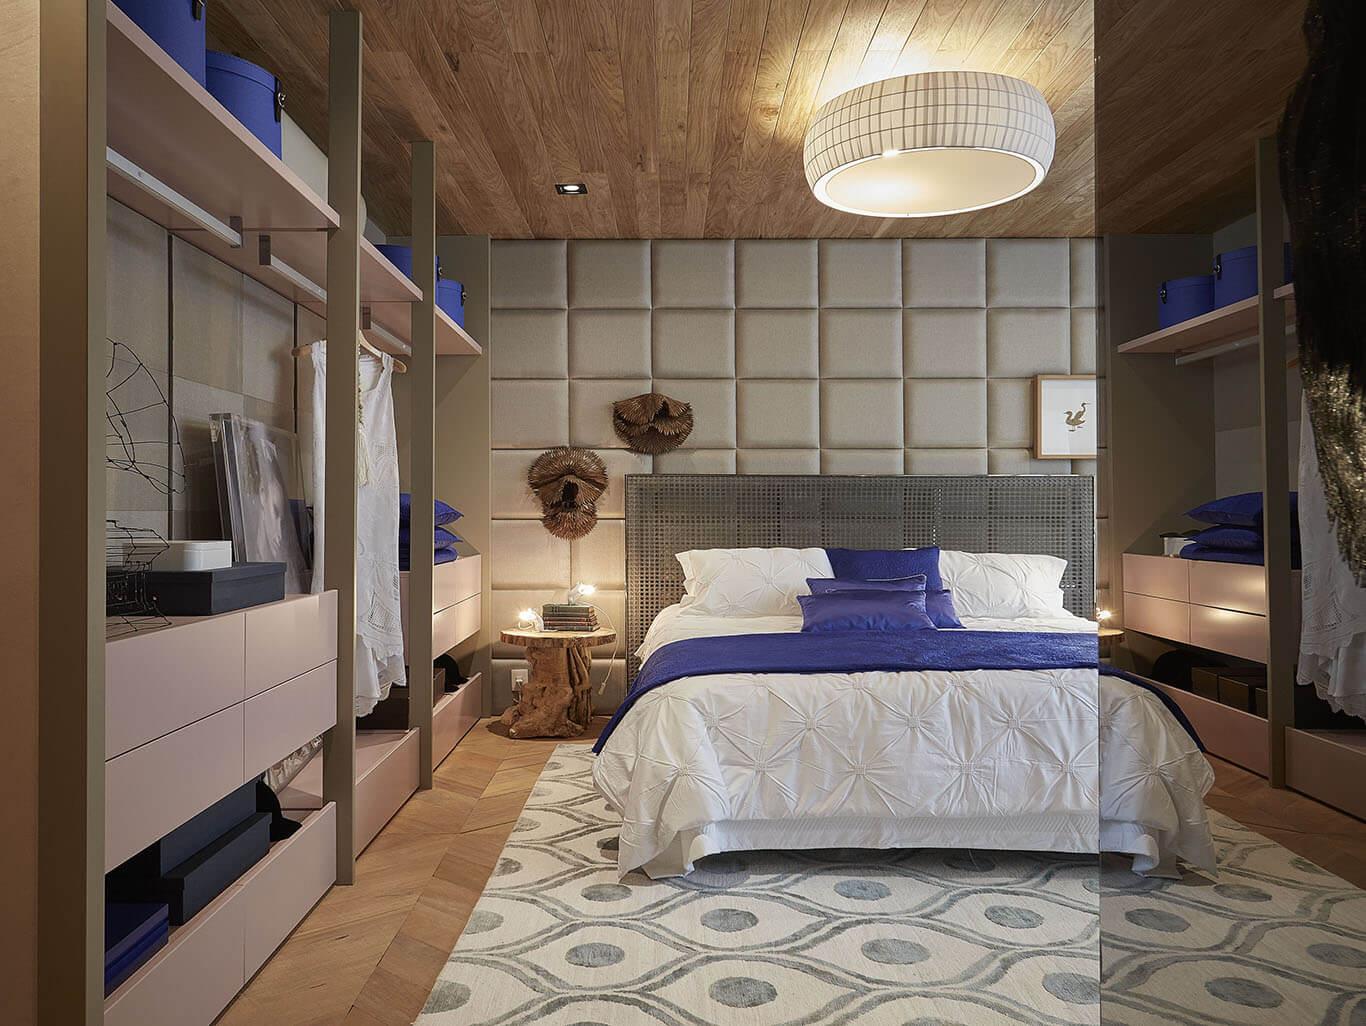 Dell Anno - Dormitório Ideias e Projetos4